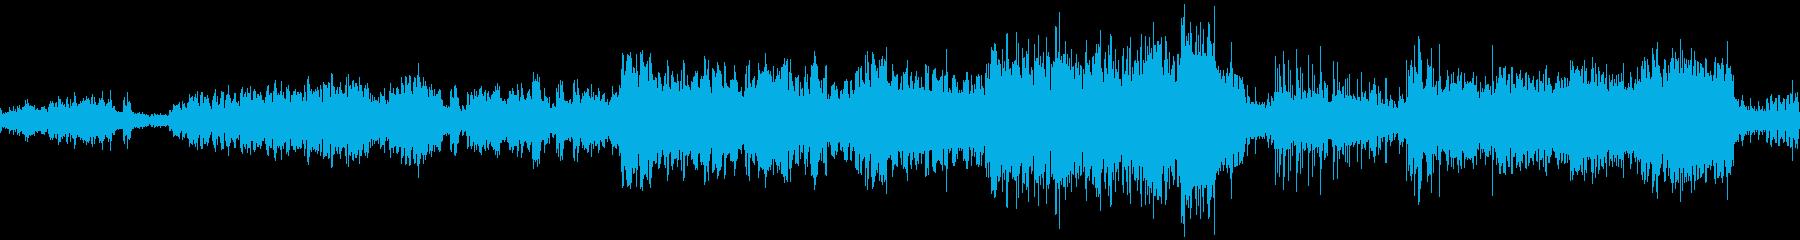 Fベーコンの絵をイメージした劇伴曲の再生済みの波形